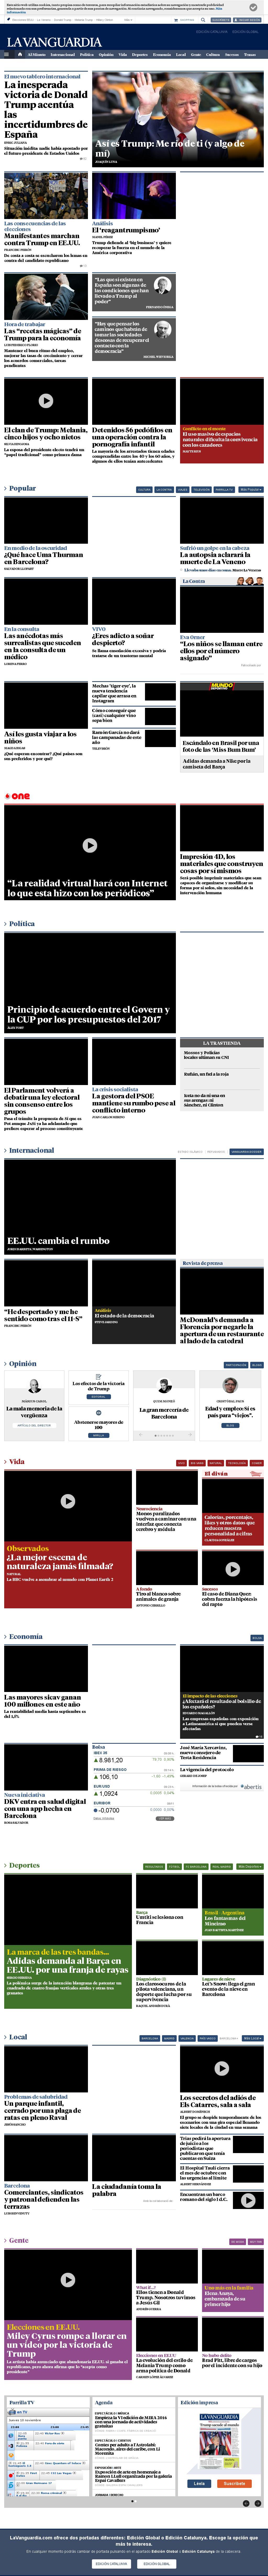 La Vanguardia at Thursday Nov. 10, 2016, 8:25 a.m. UTC